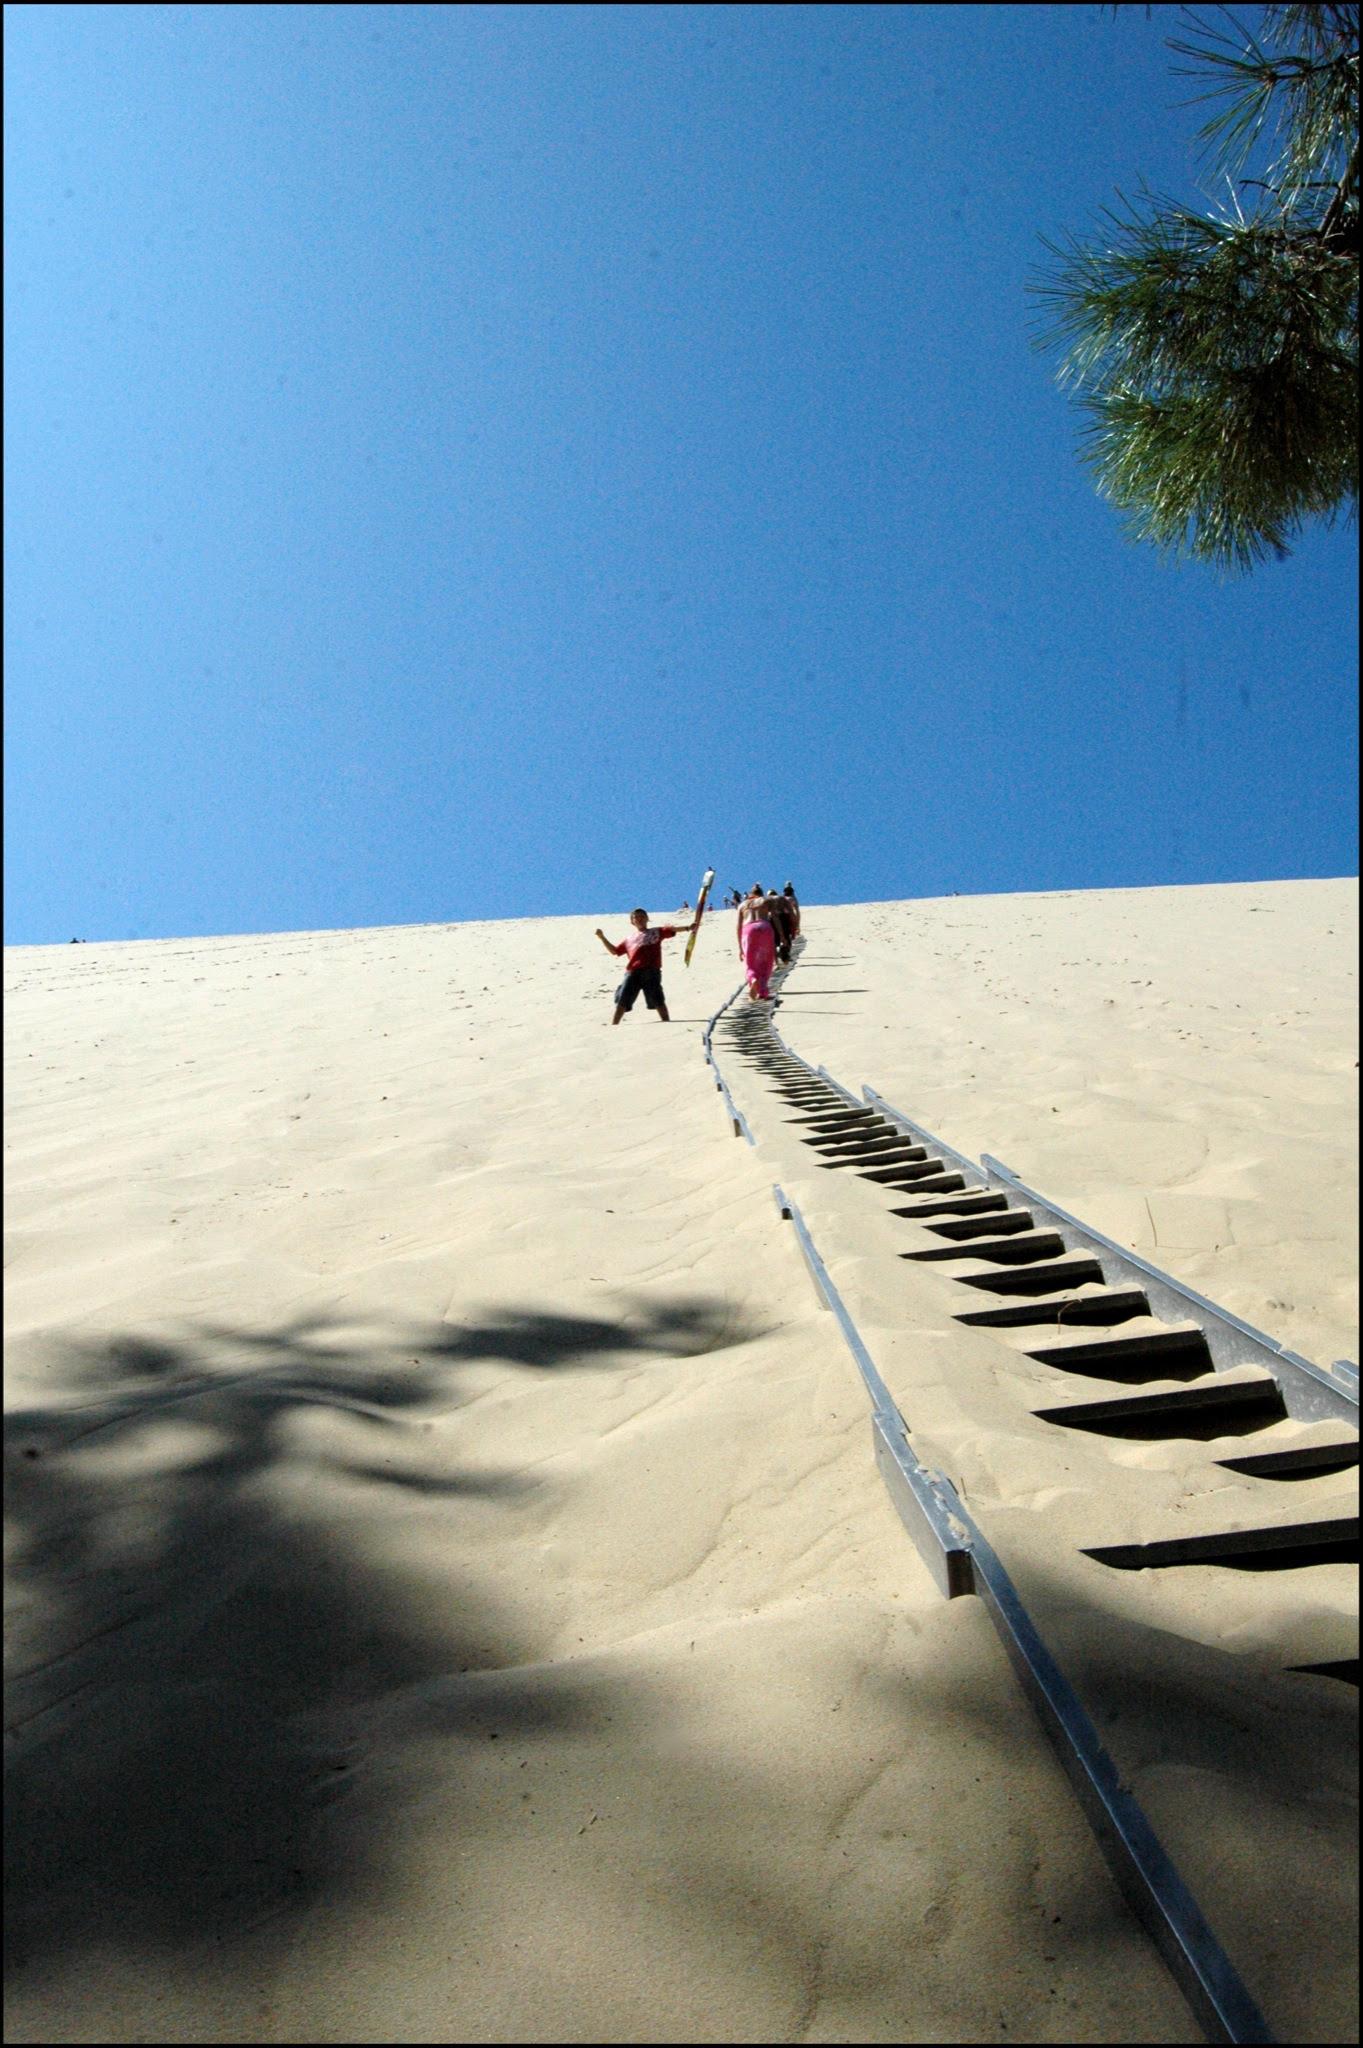 8YLEc Dune de Pyla   A new Sahara desert being born   in France! [30 pics]